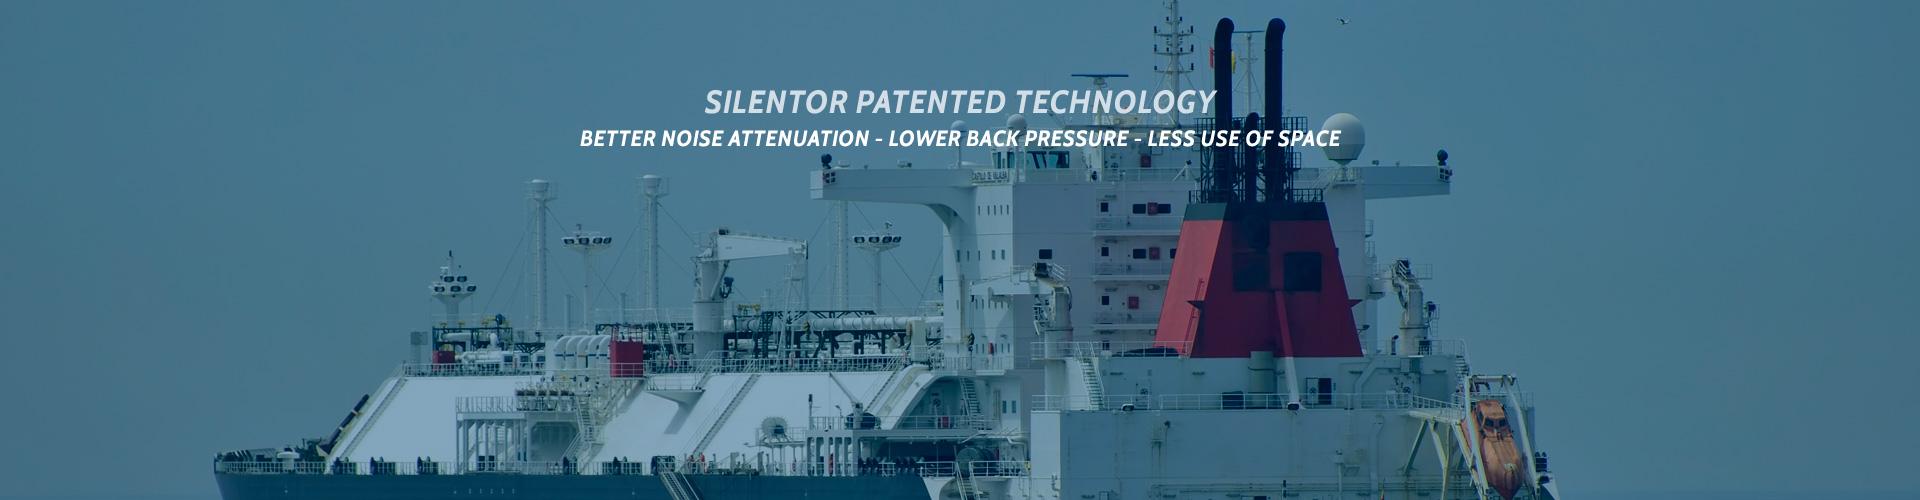 silentor-banner-marine